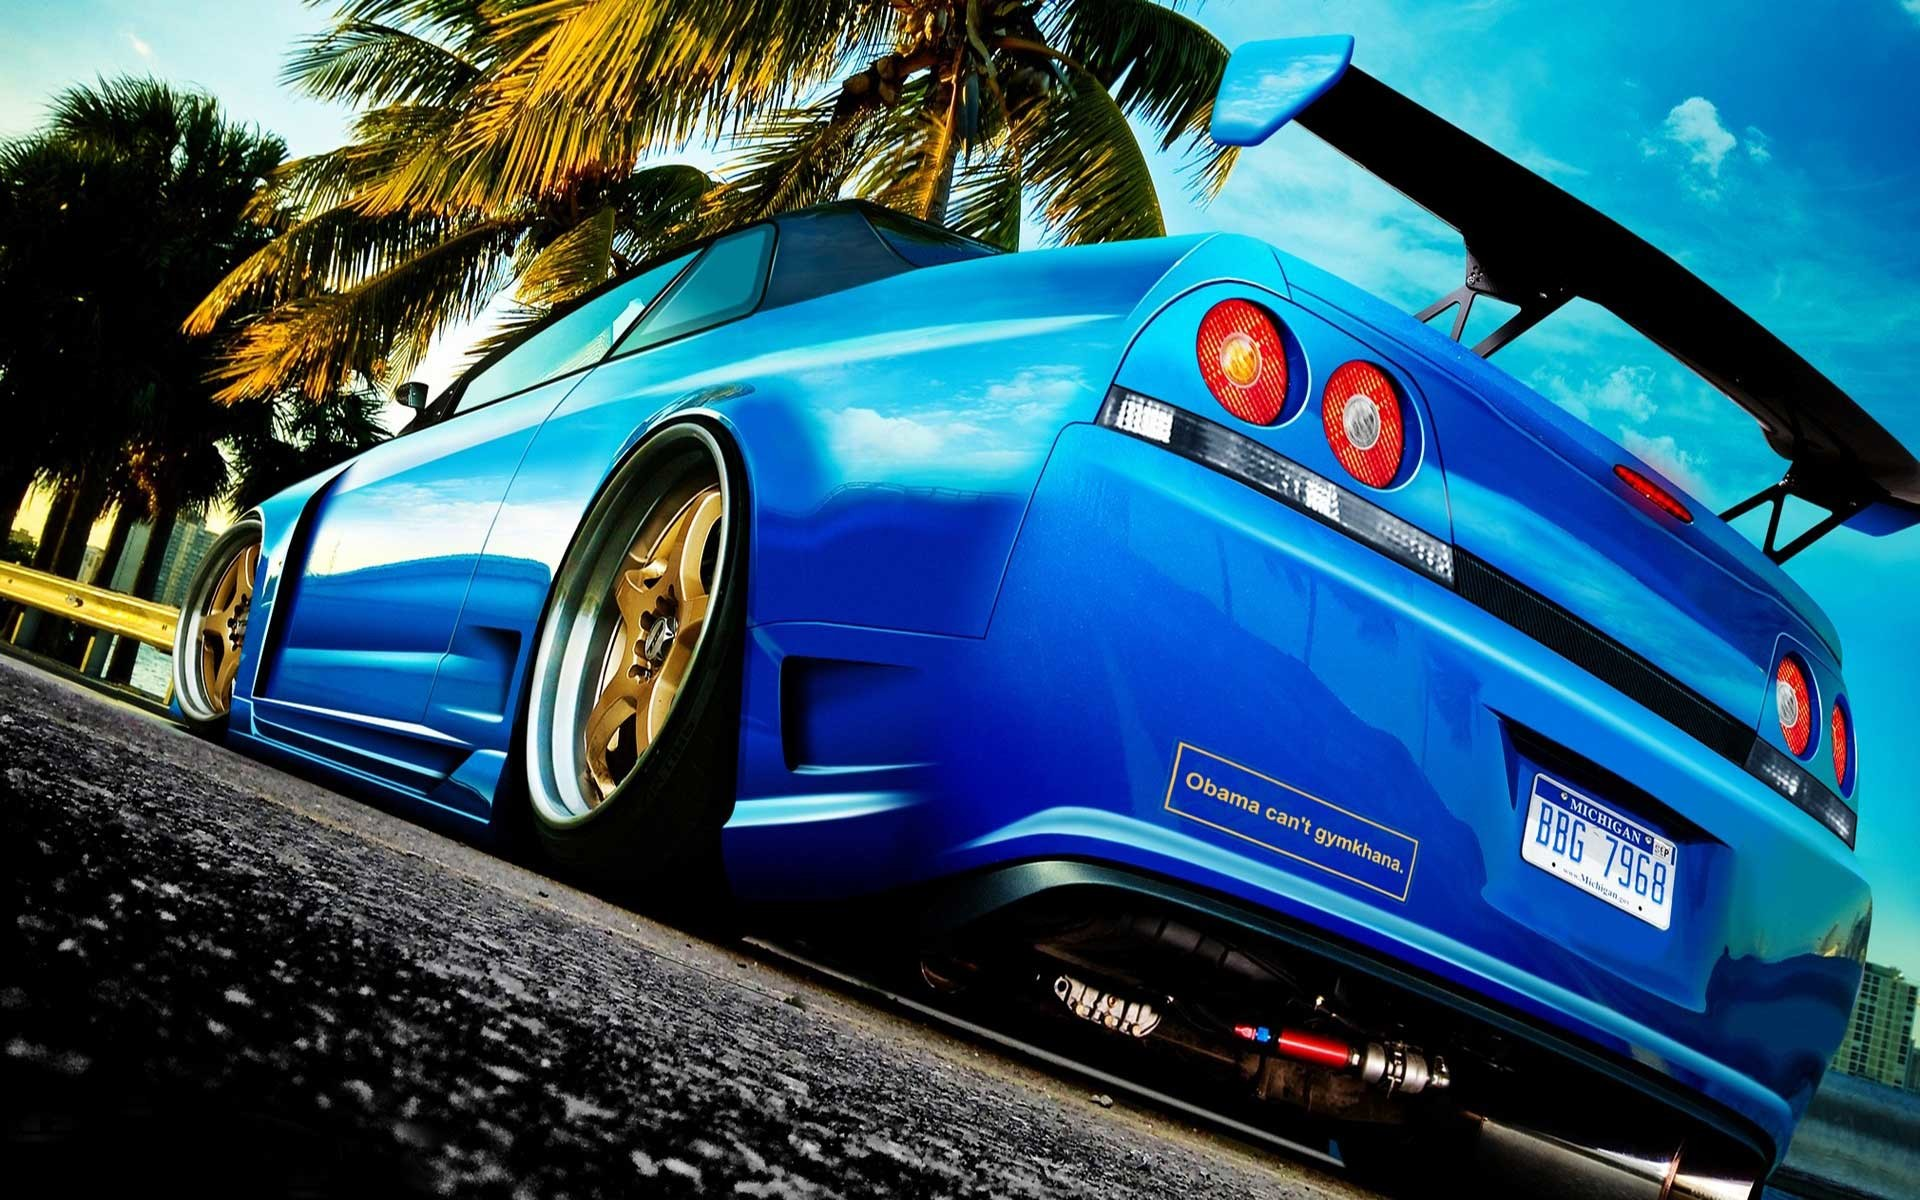 Cool Car 100% Quality HD Wallpaper Desktop